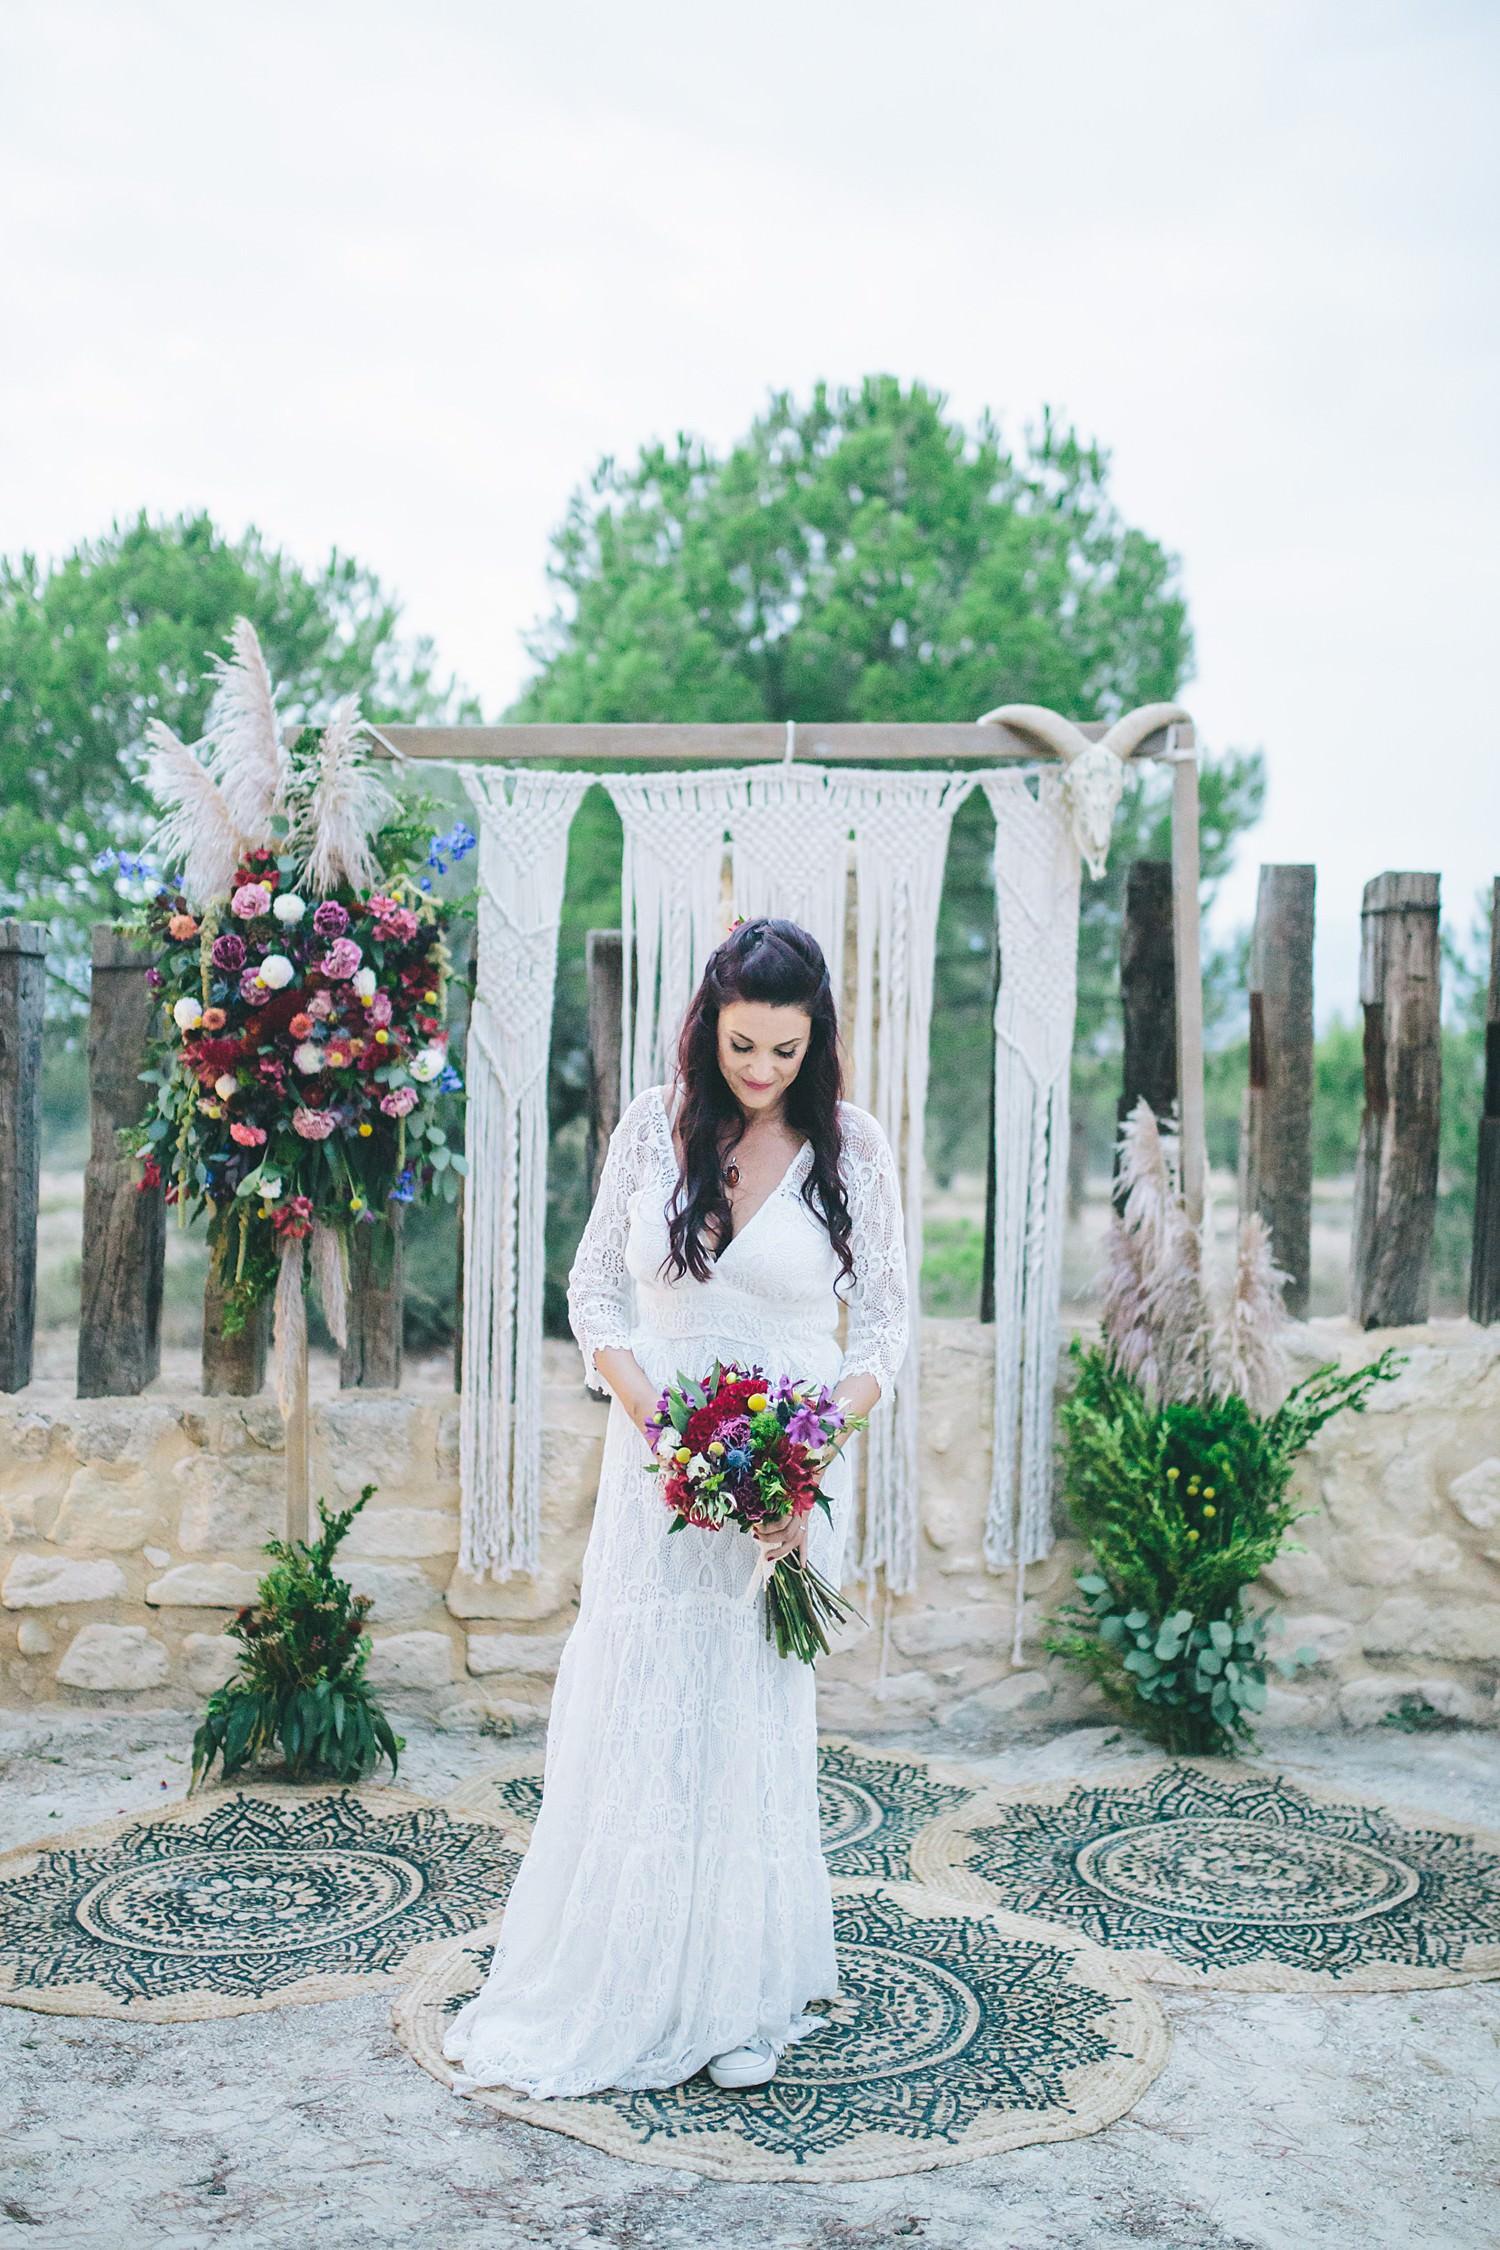 Boho bride macrame wedding backdrop destination wedding photographer